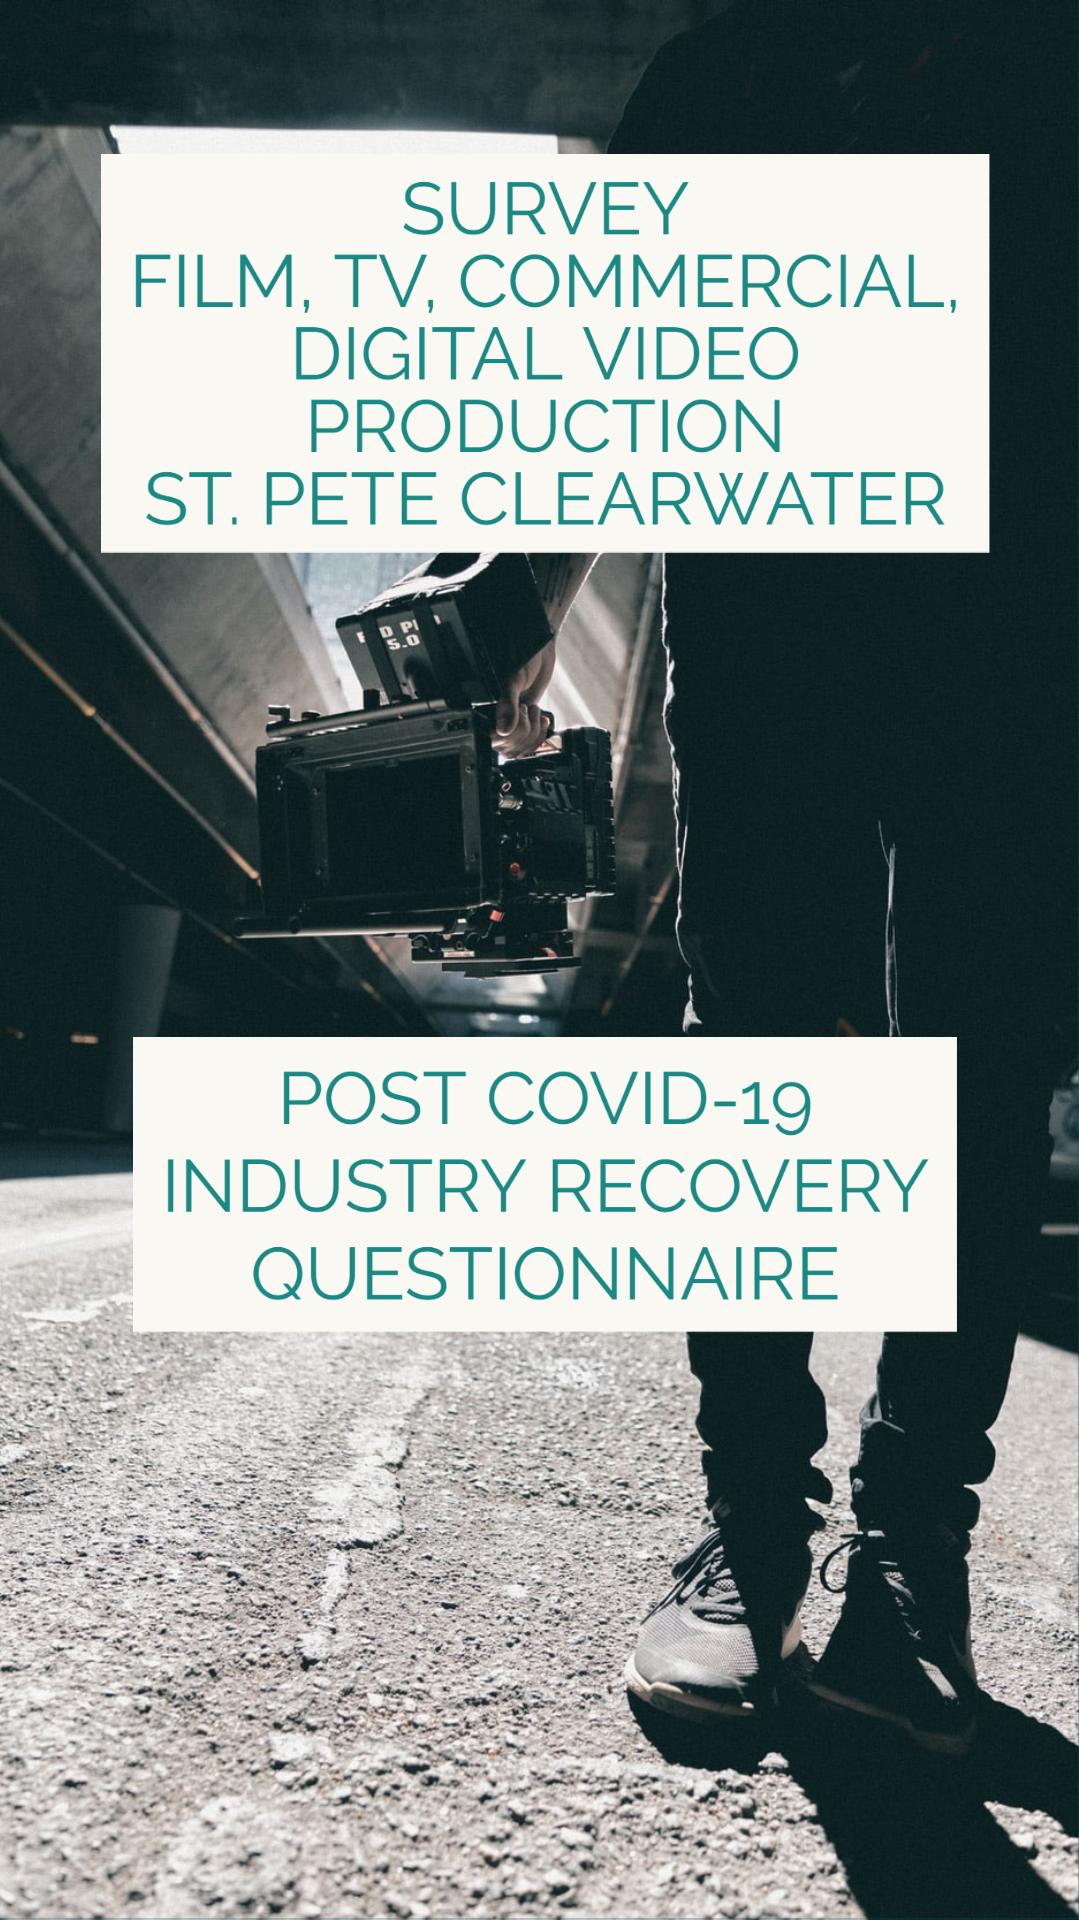 FilmSPC Post COVID-19 Survey